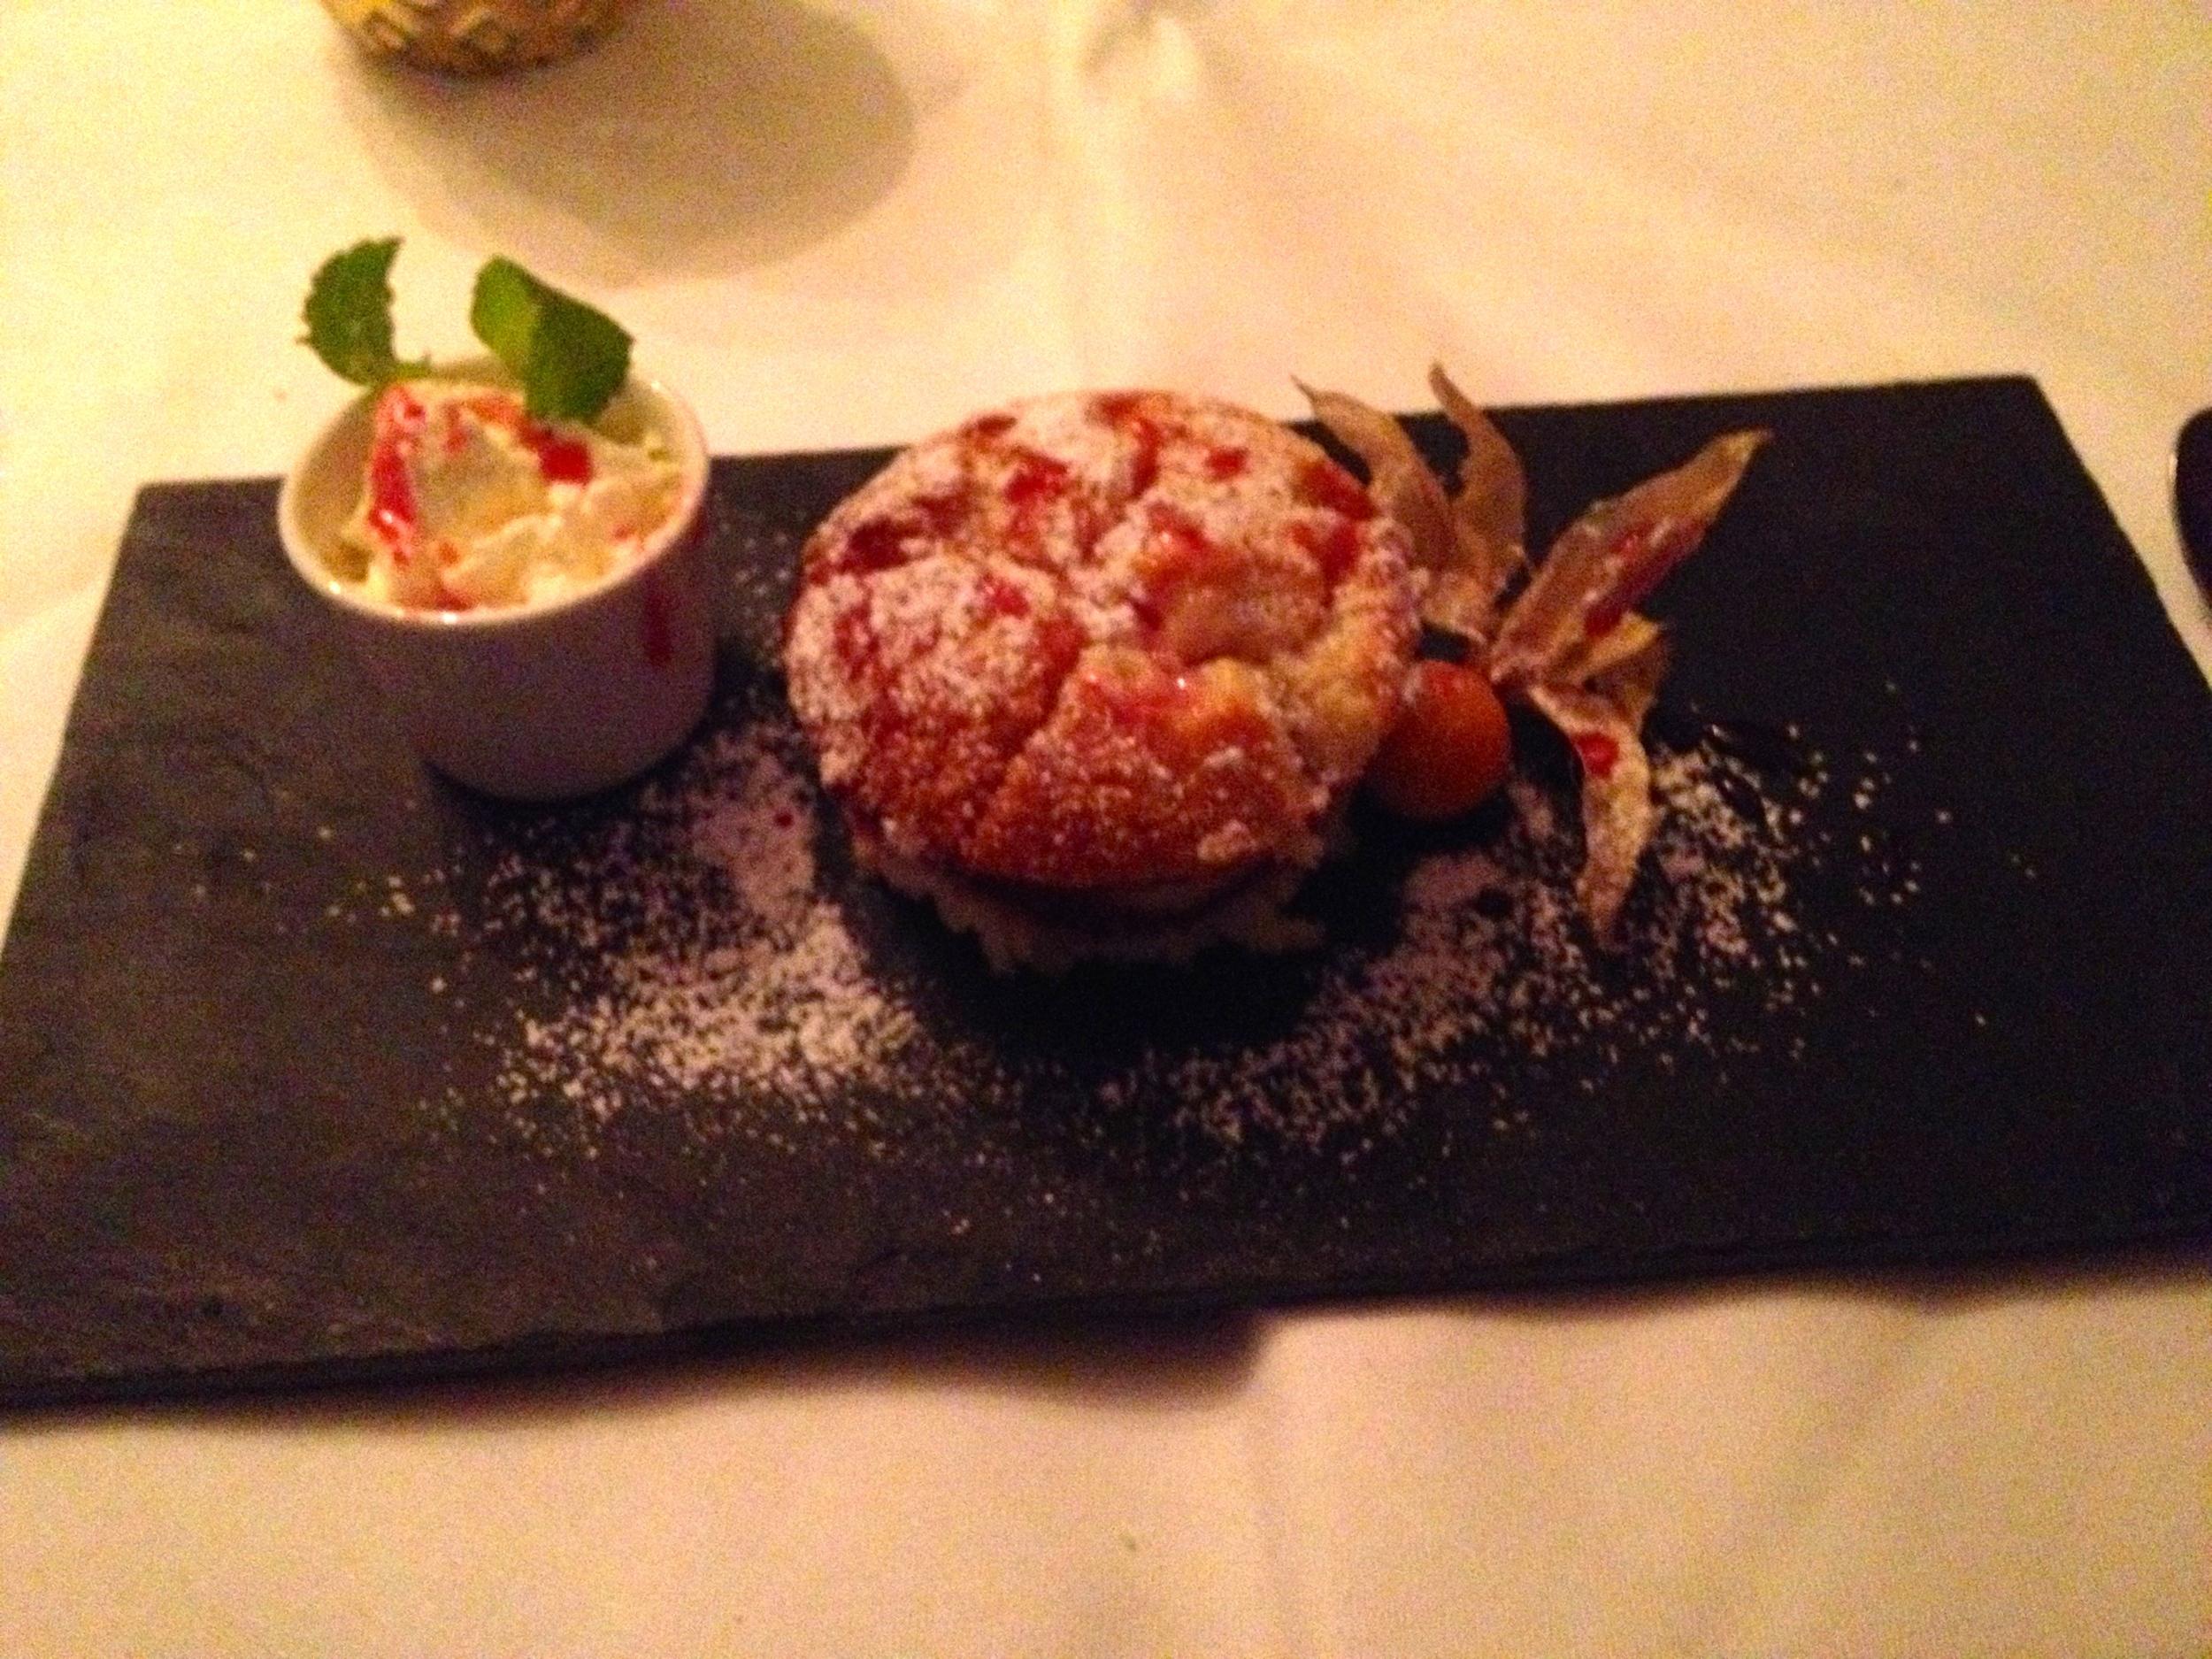 Raspberry semolina cake for dessert